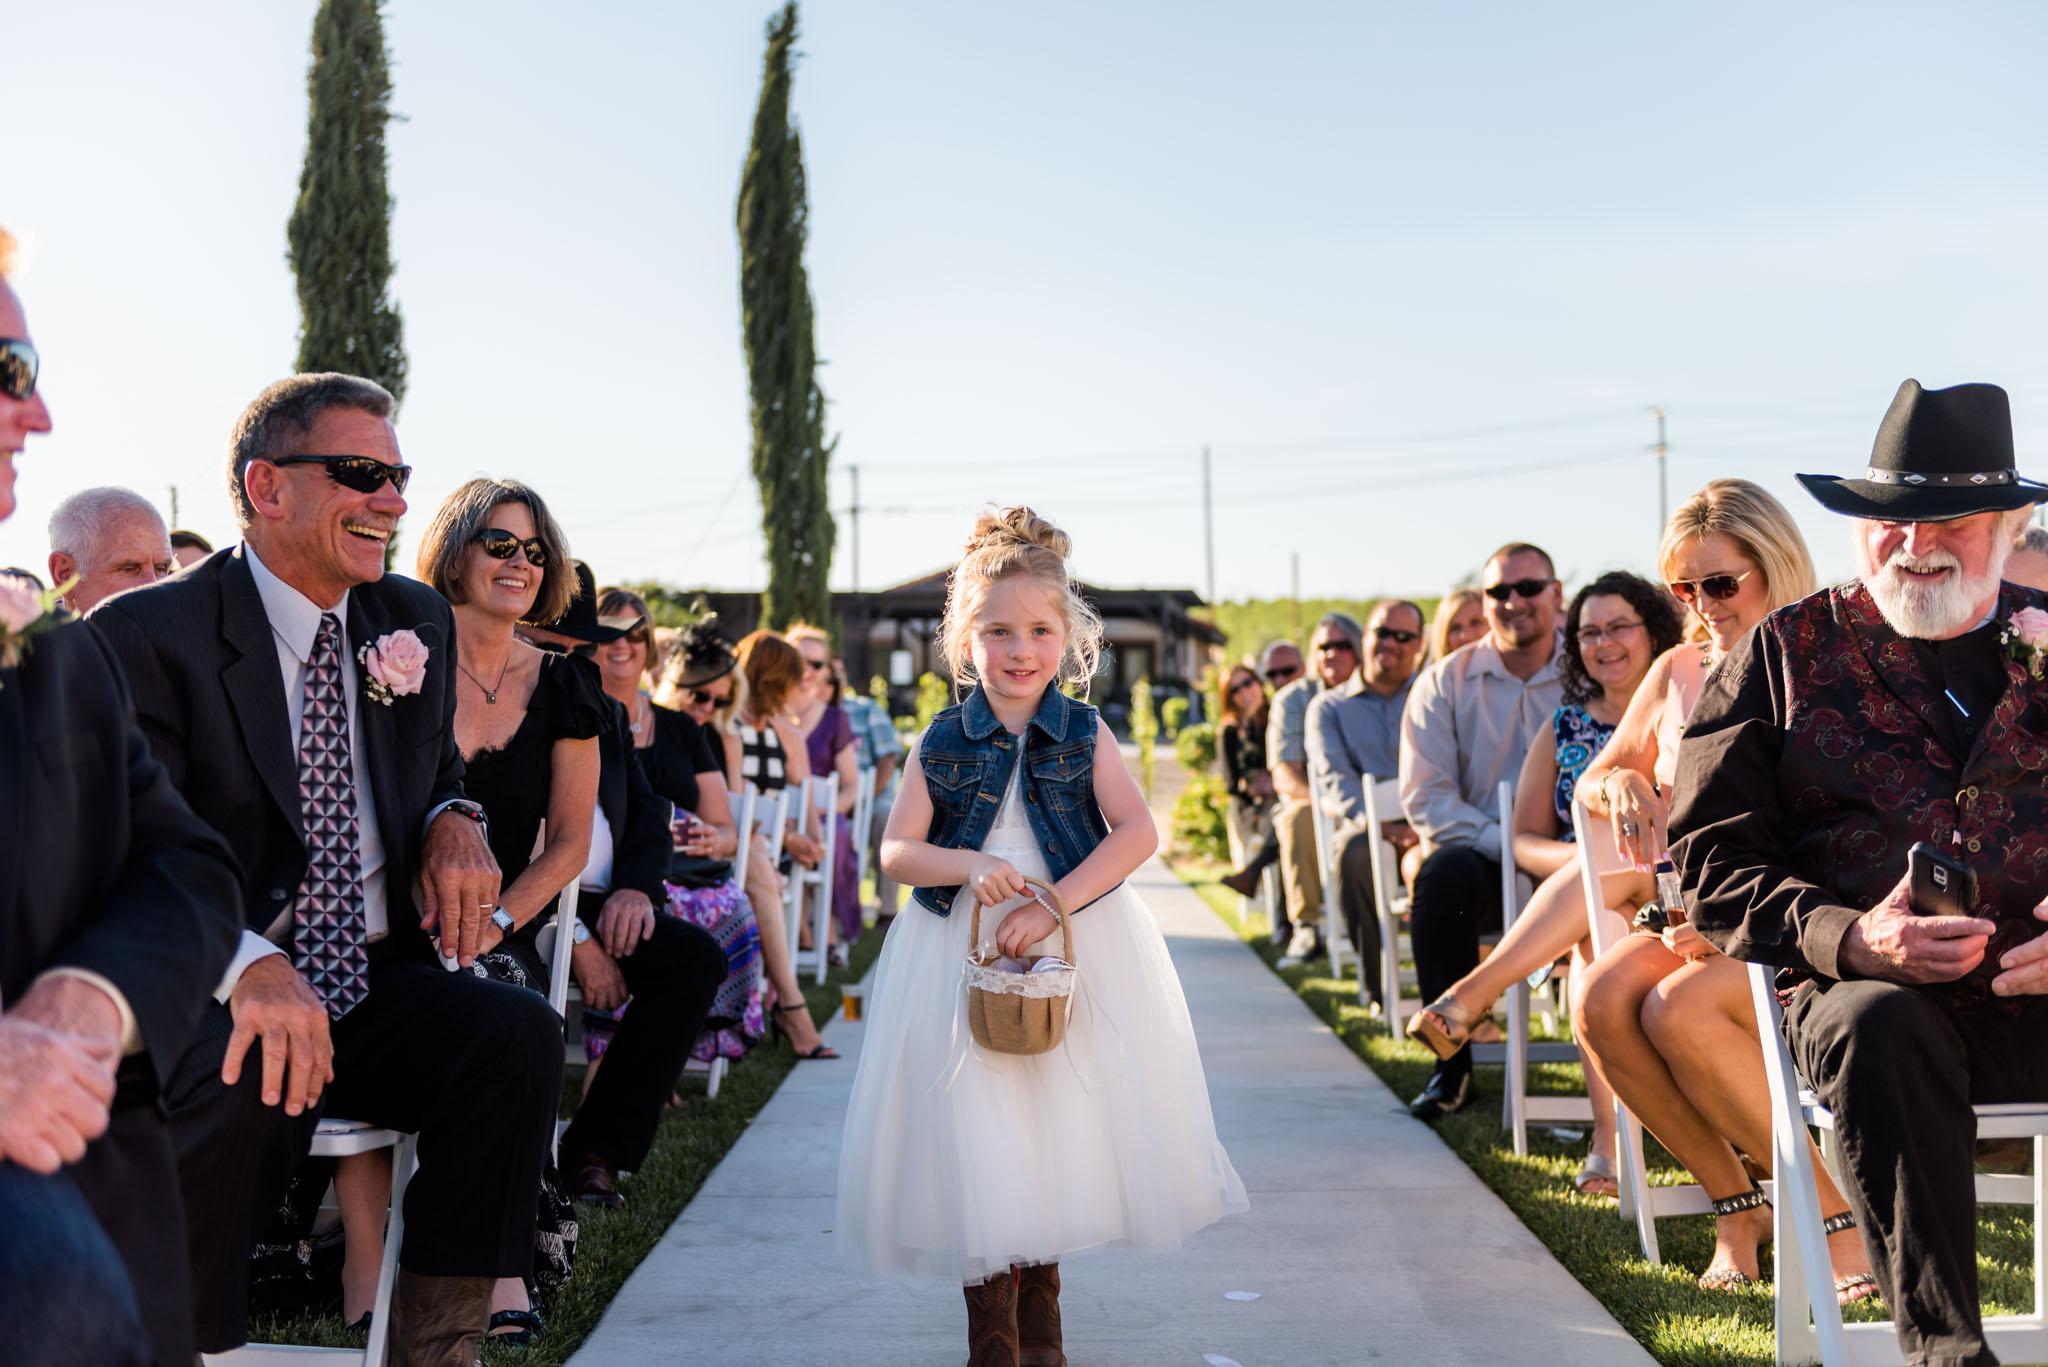 Avensole-Winery-Temecula-Wedding-Josh-and-Olivia-3469.JPG